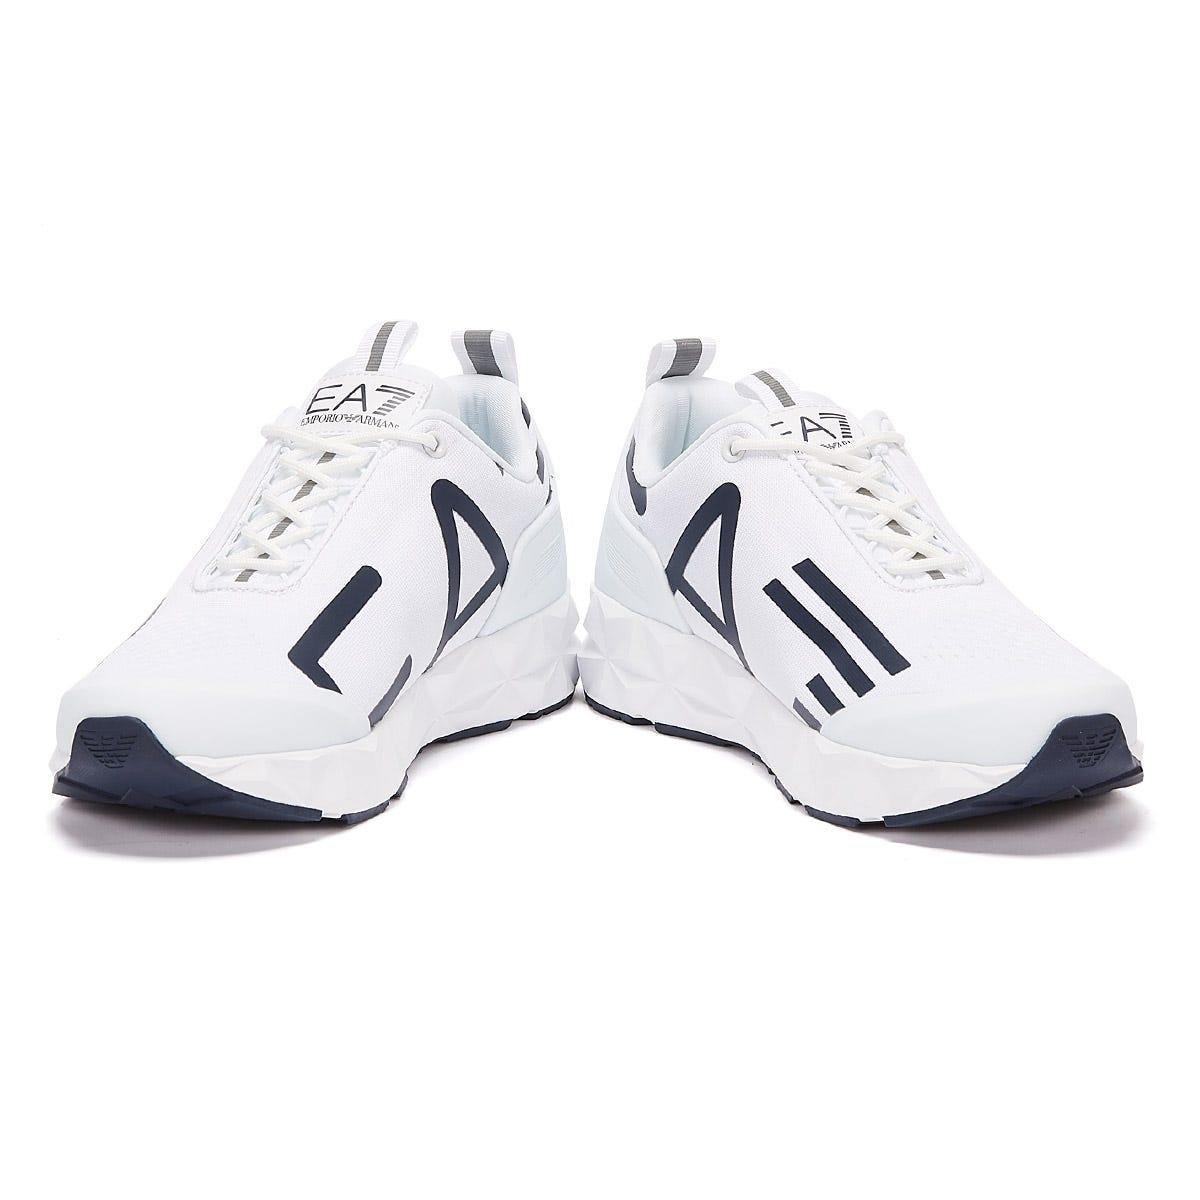 Emporio-Armani-EA7-Ultimate-C2-Kombat-Masculino-Azul-Marinho-Branco-Sapatos-Tenis-Designer miniatura 6